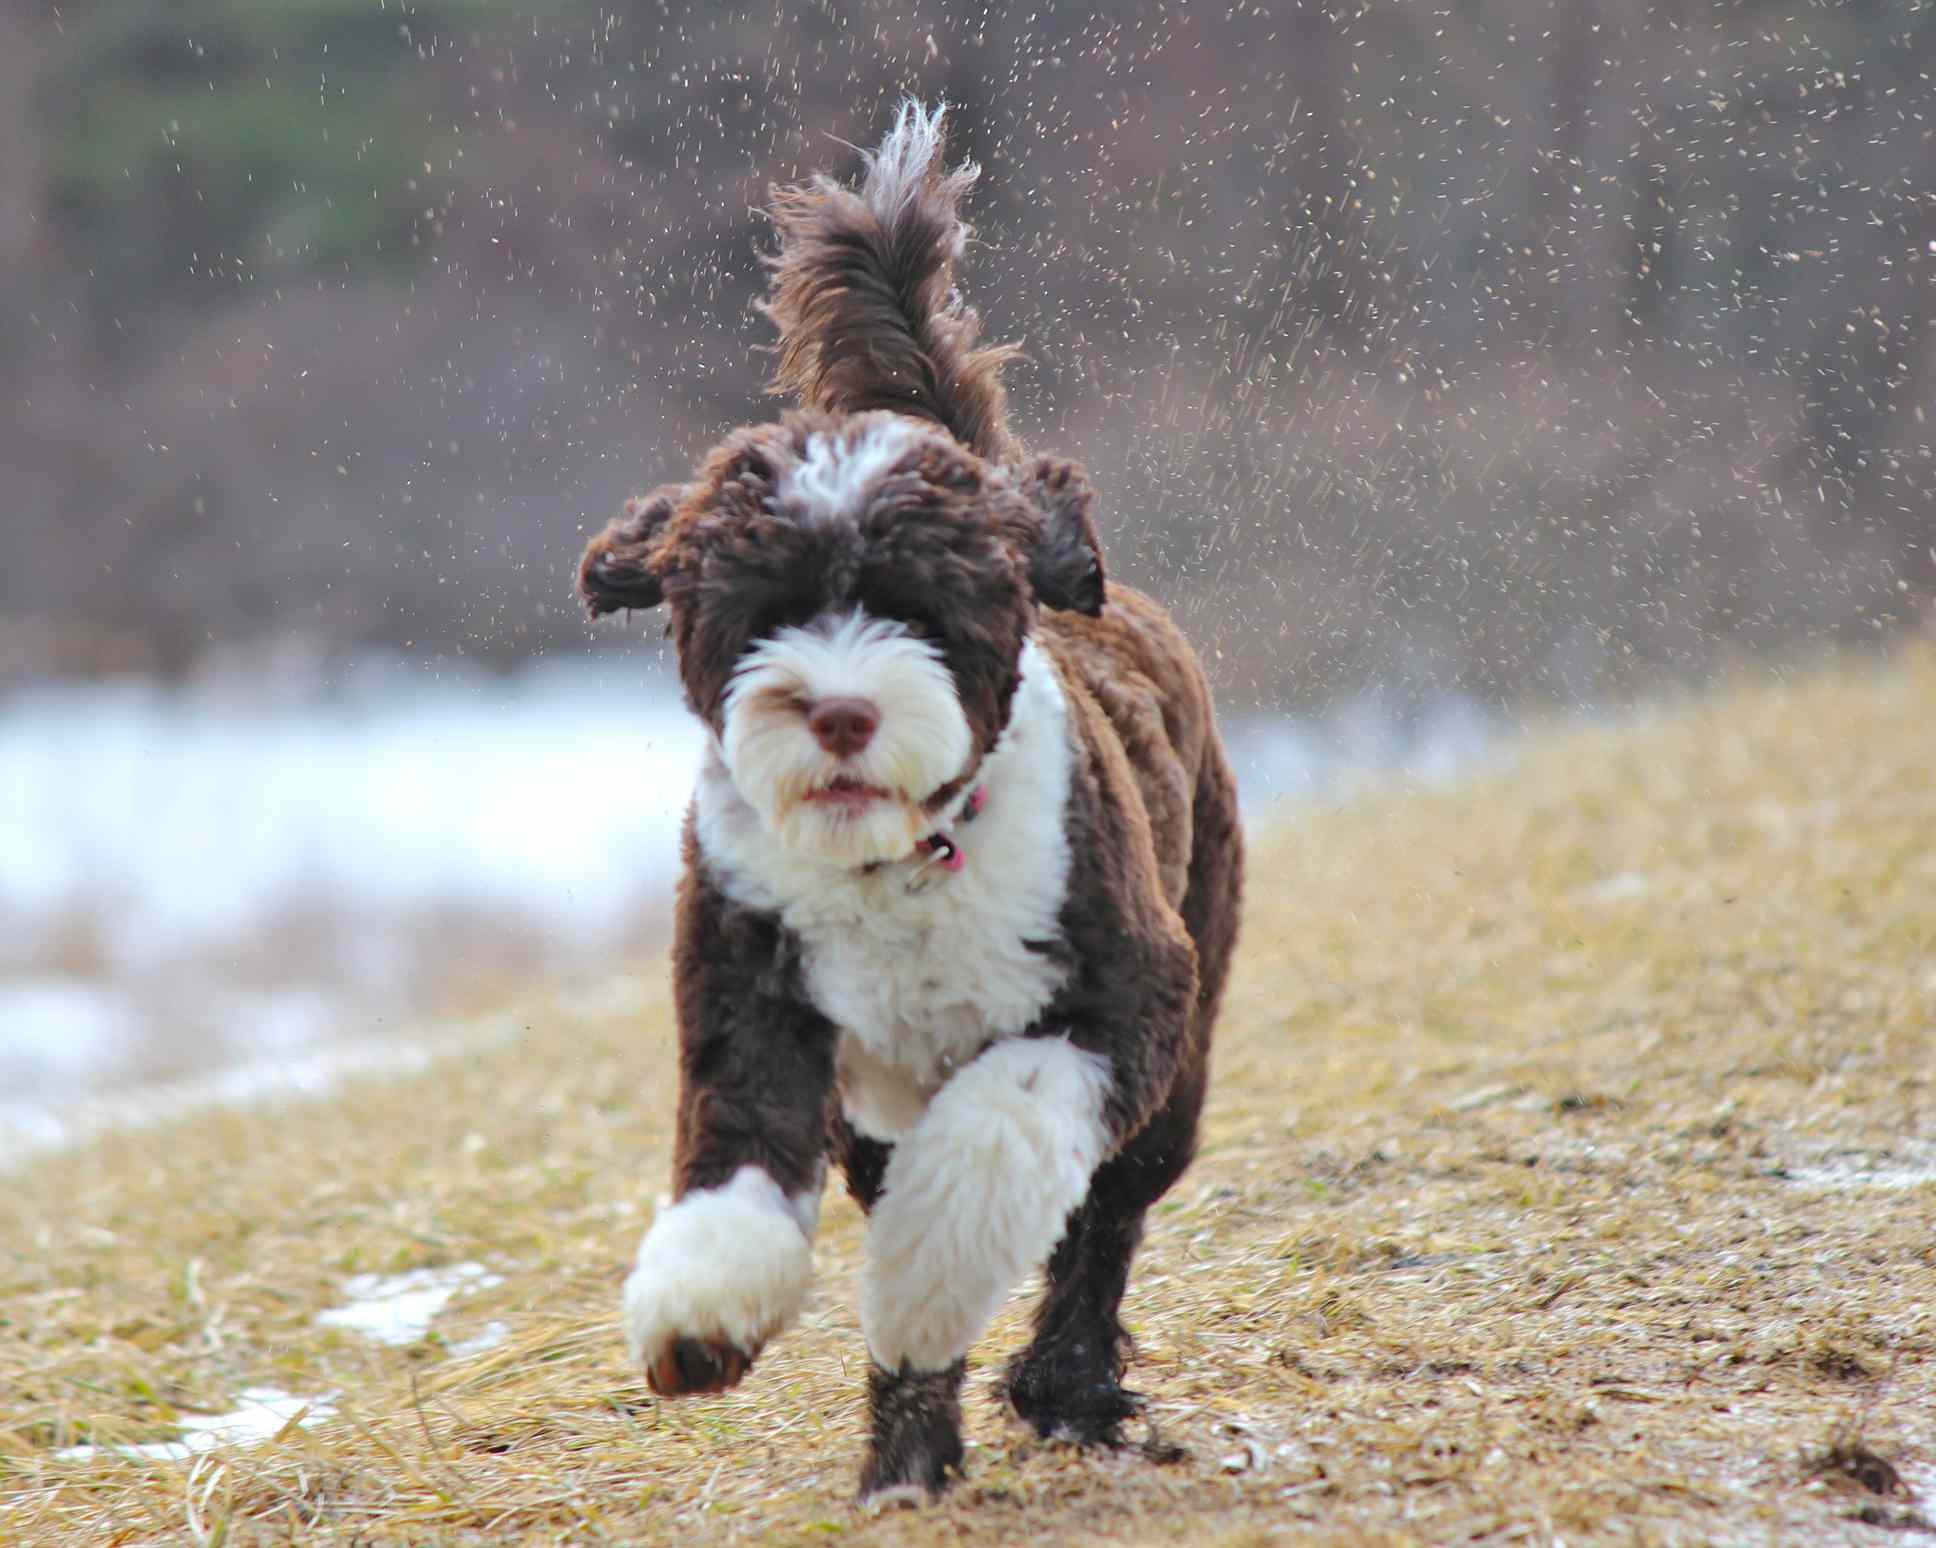 Portuguese water dog running